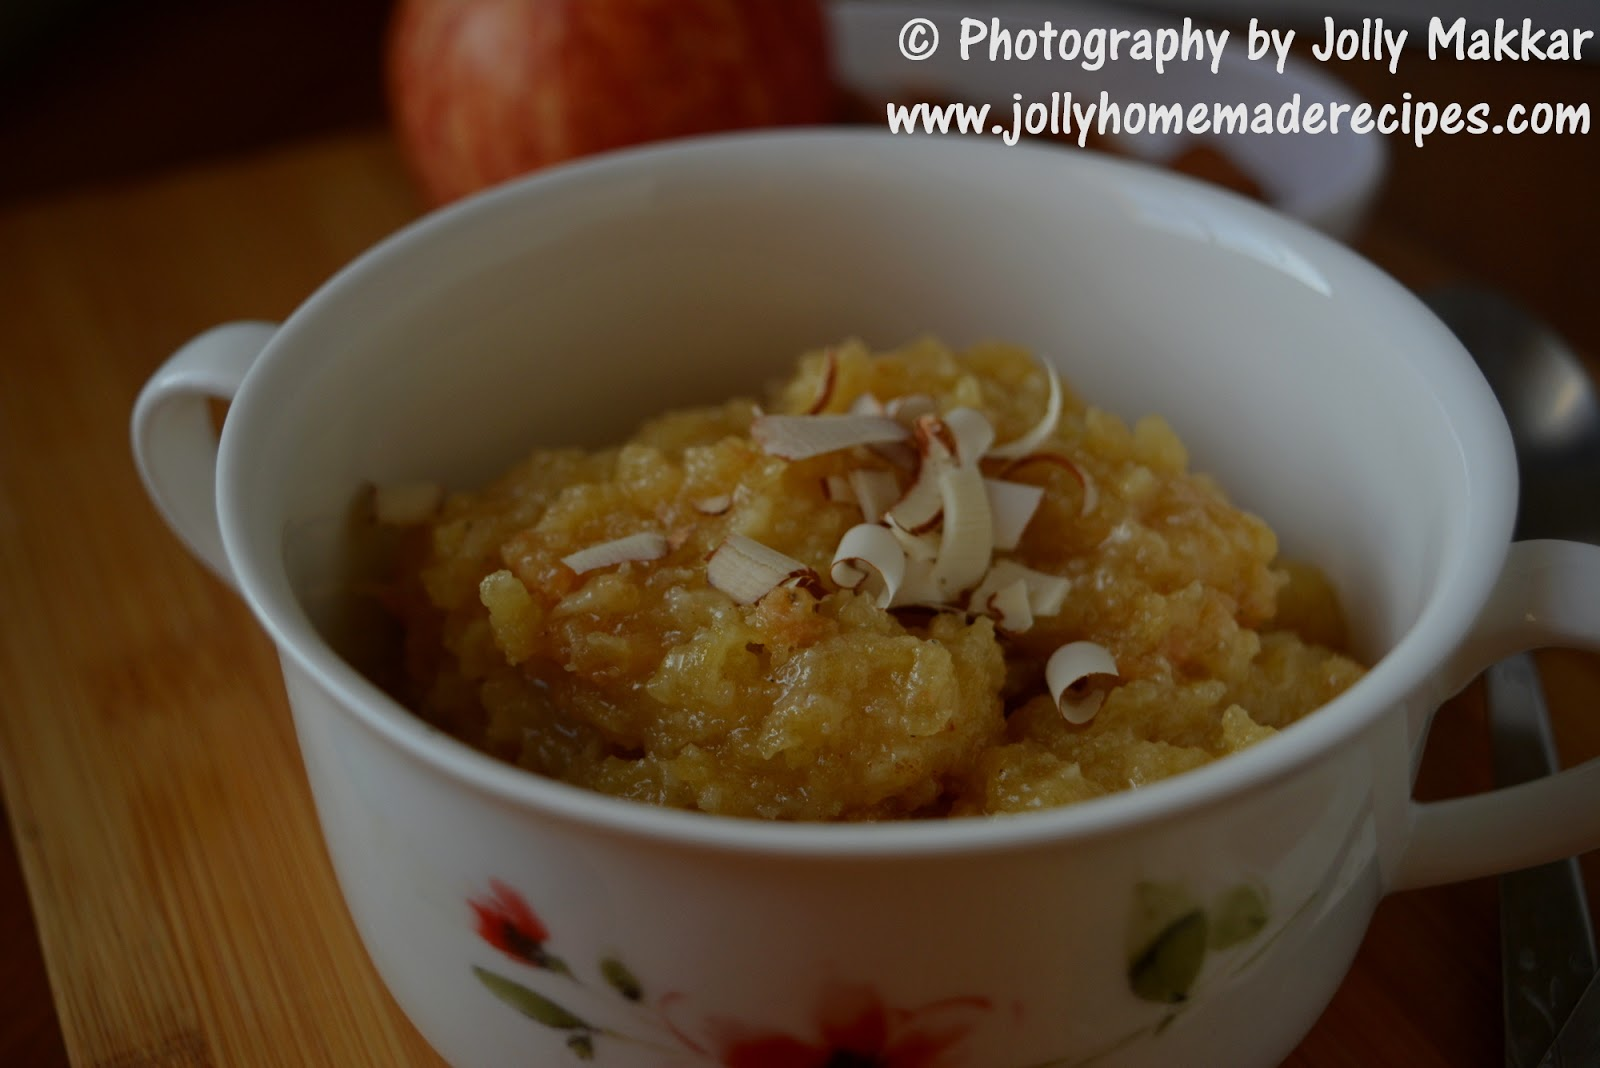 apple pudding recipes